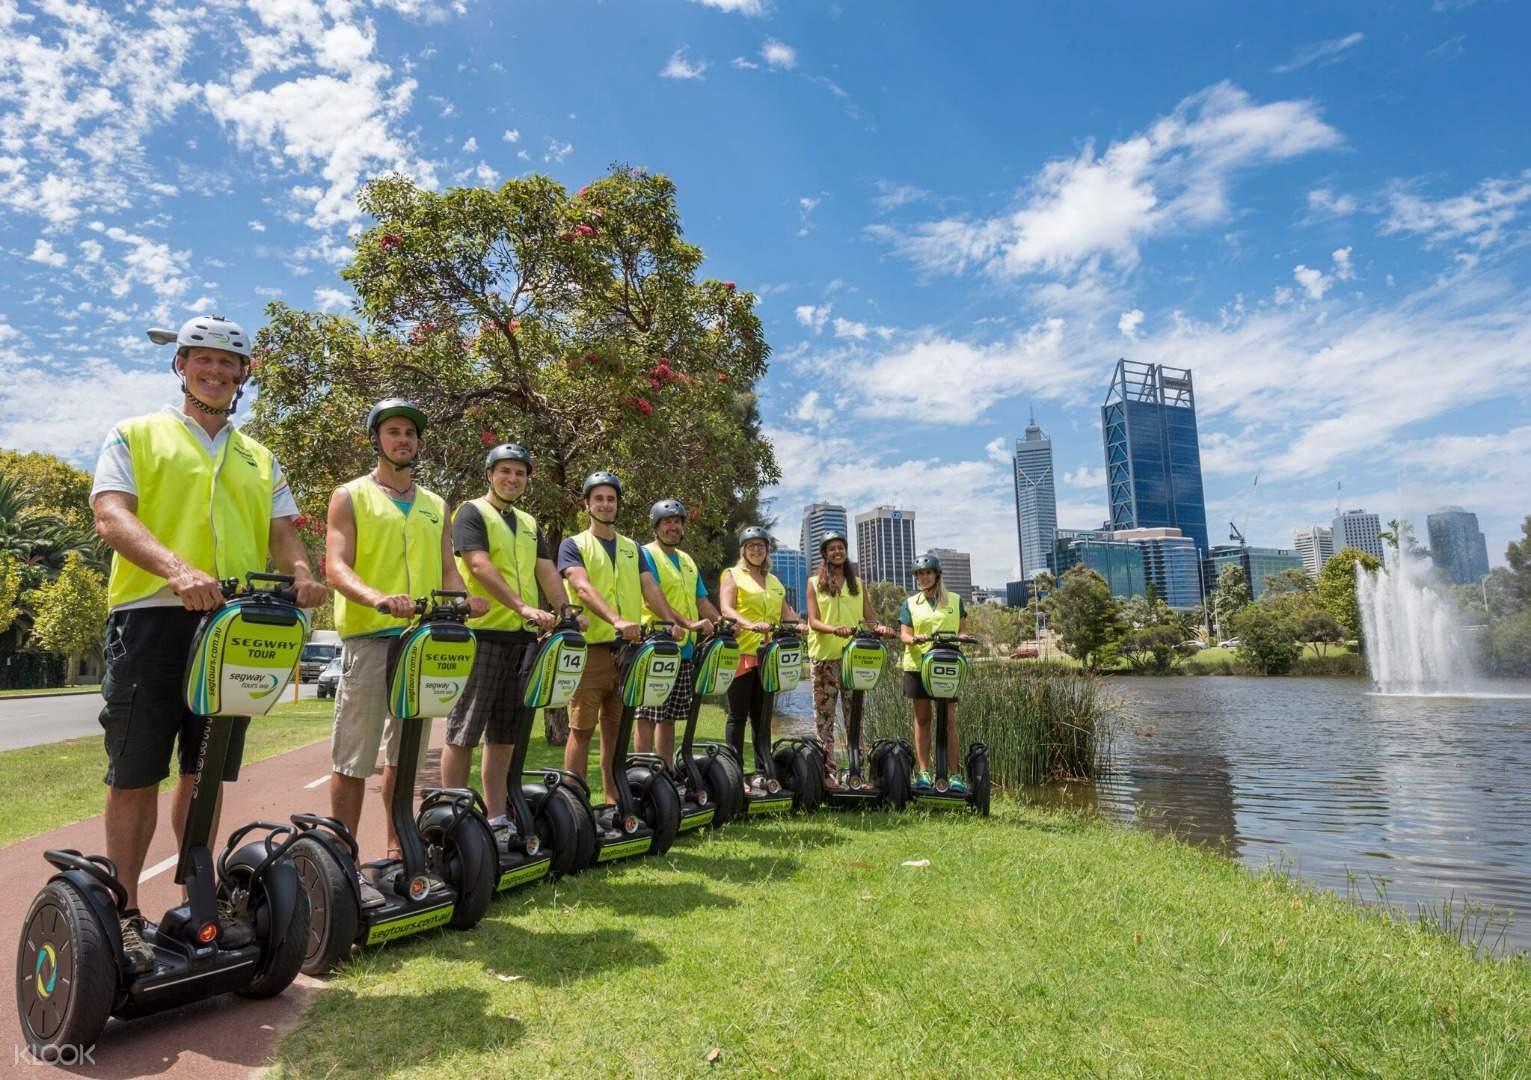 City Riverside Segway Tour Perth, Australia - Klook